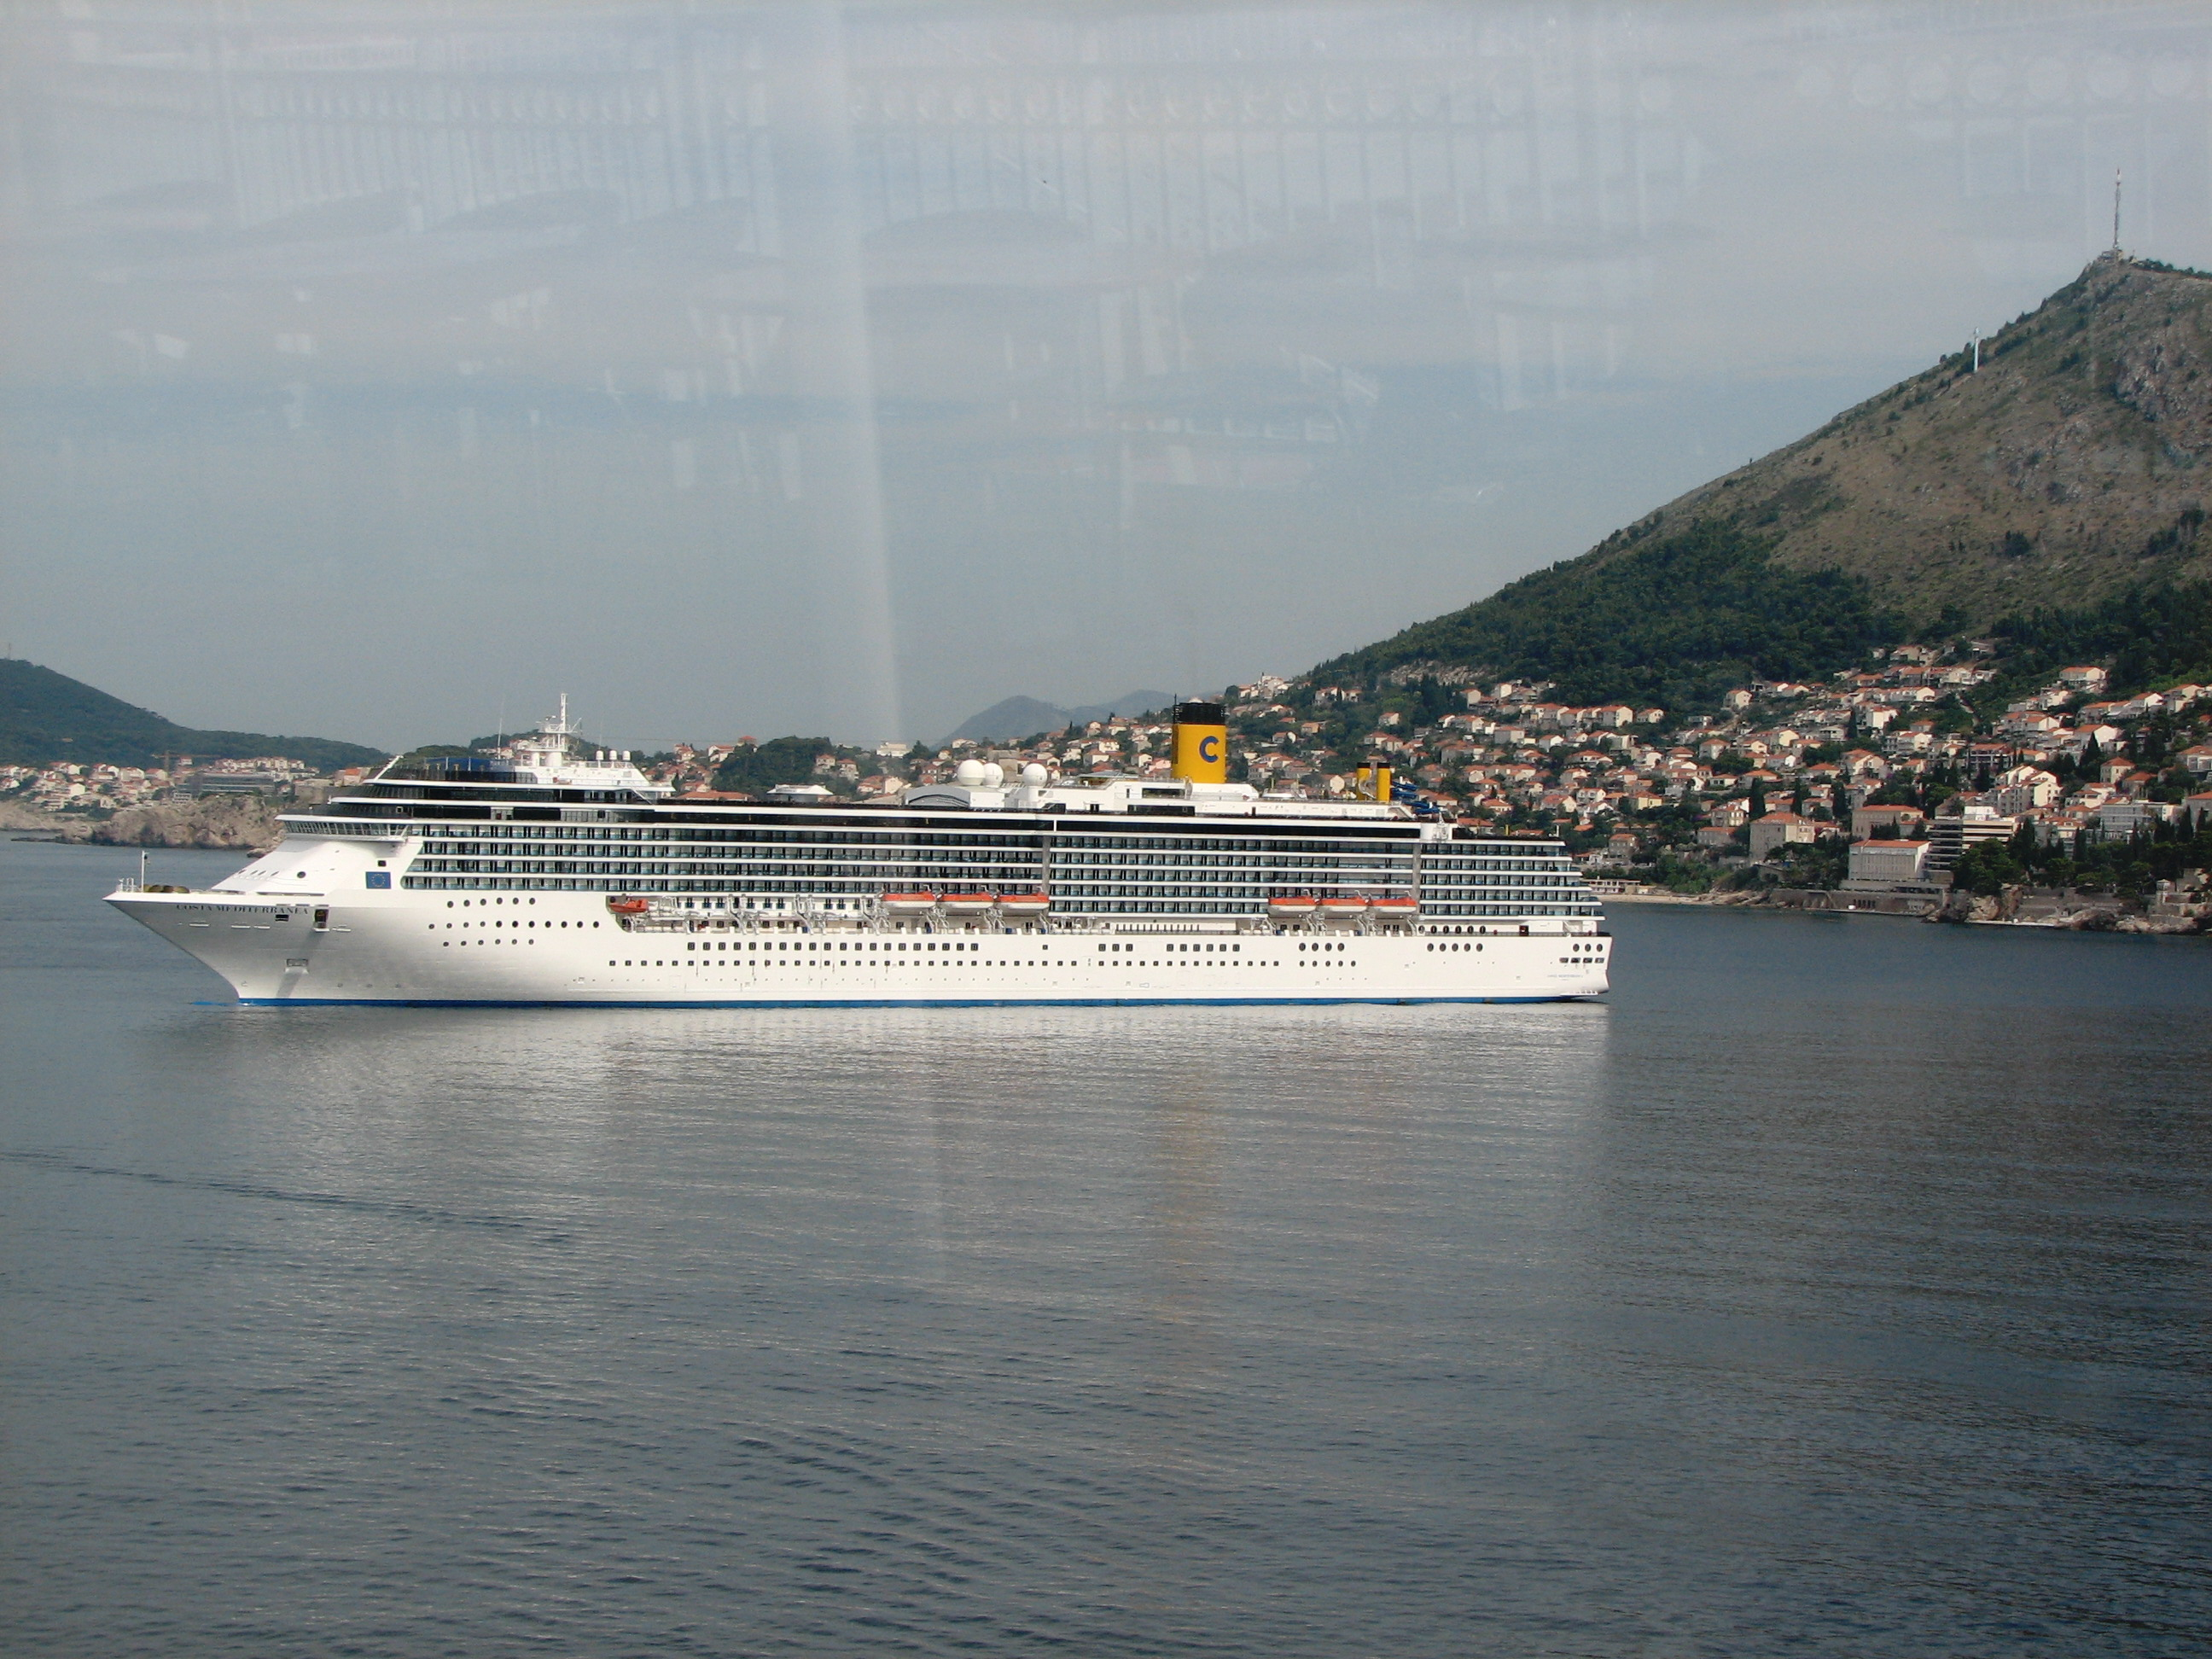 FileCruise Ship Costa Mediterranea  Dubrovnik Croatia